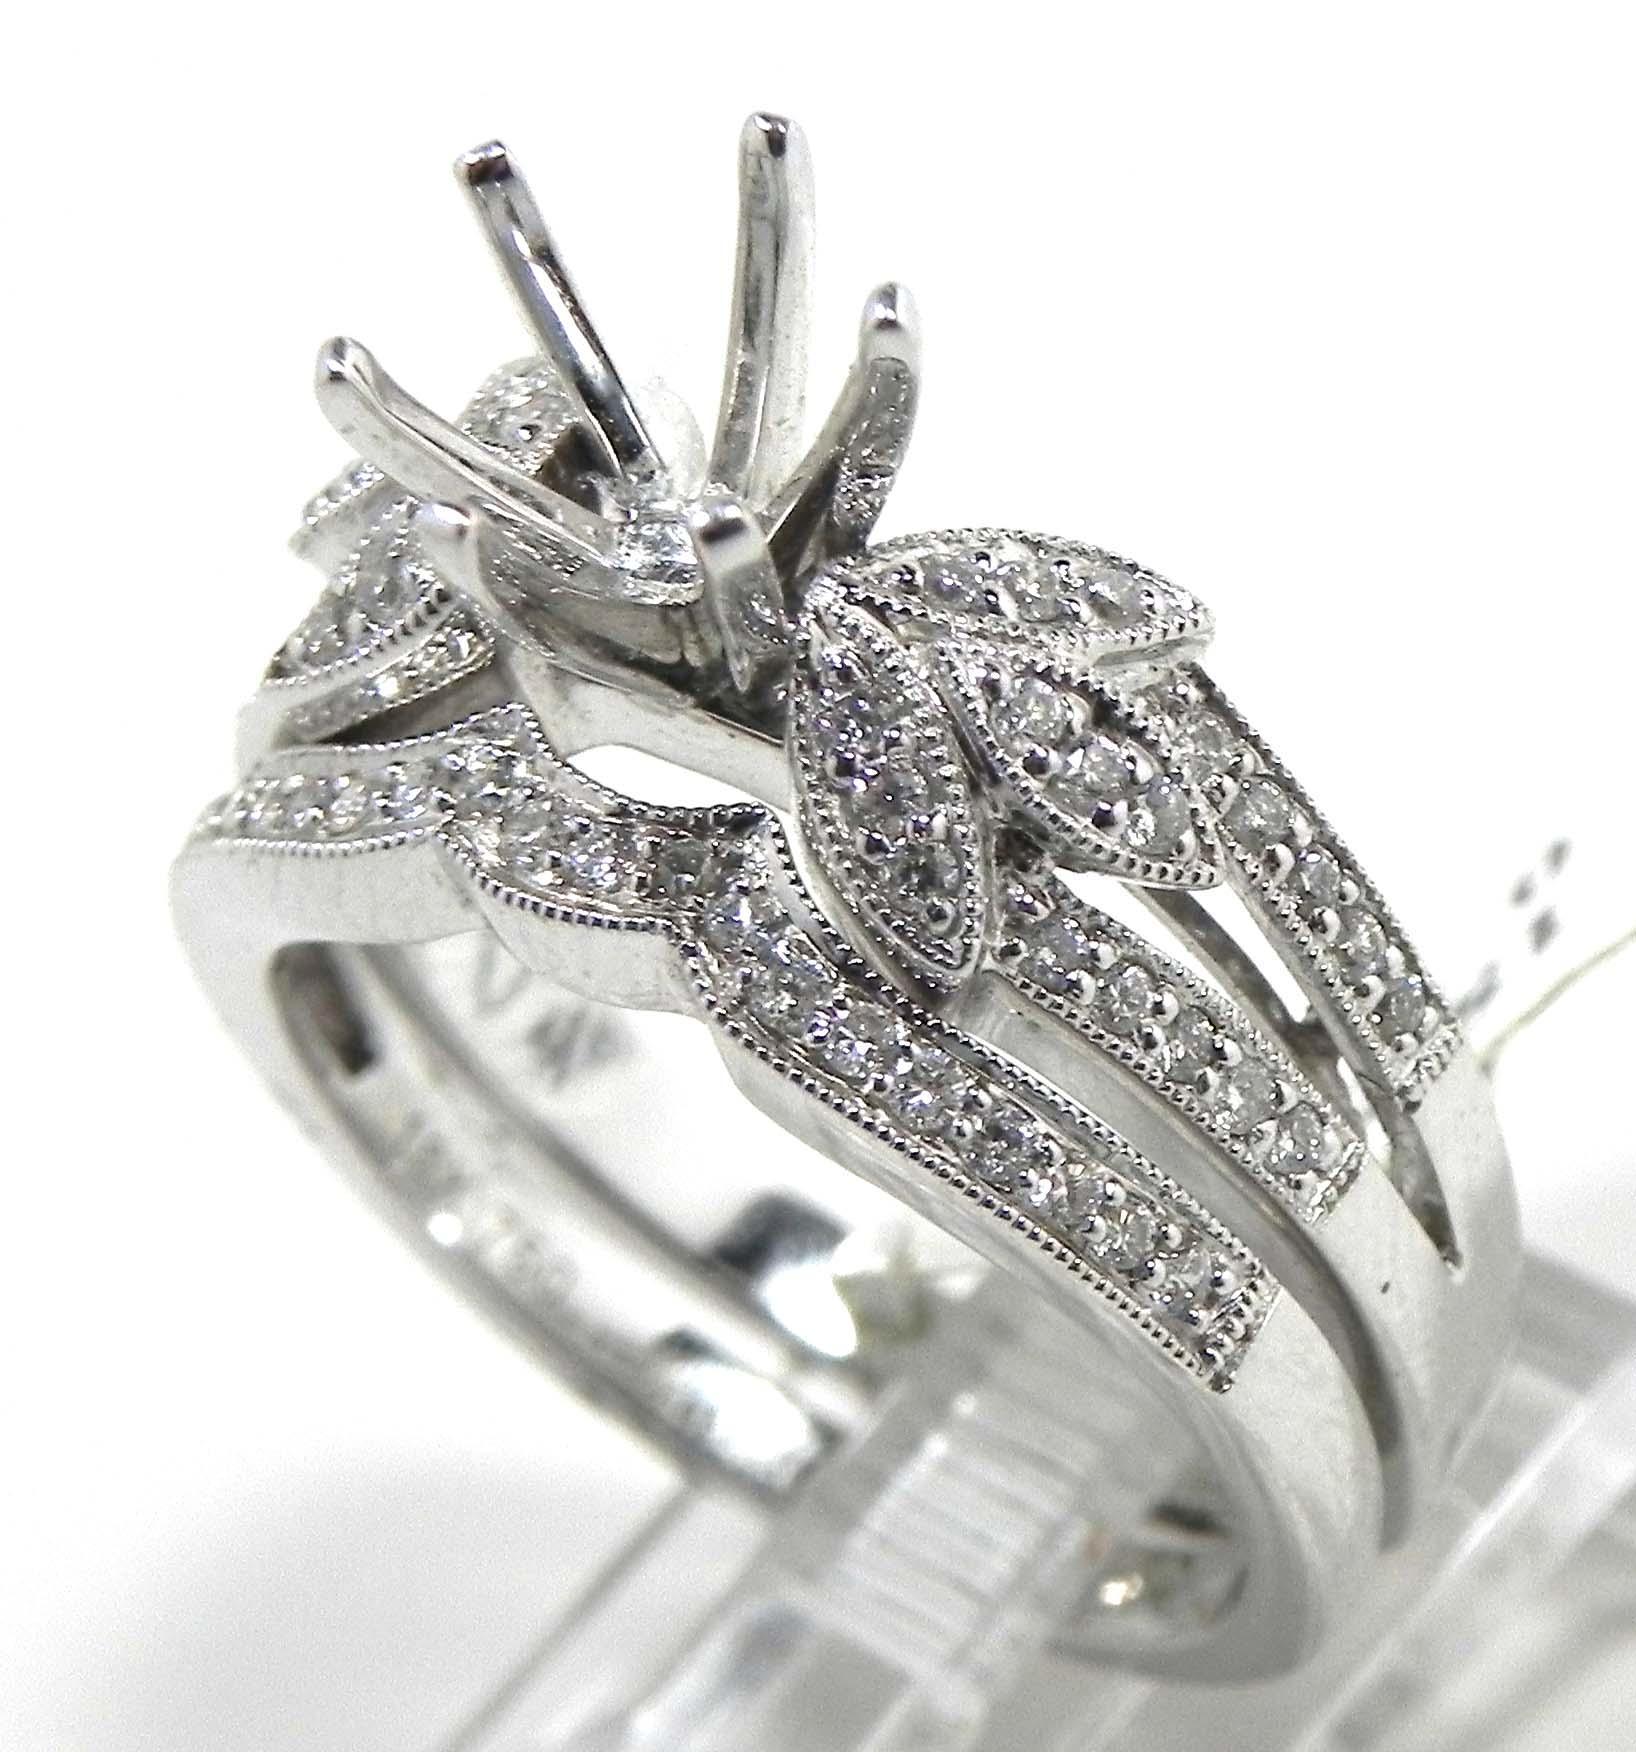 La s 18k White Gold Diamonds Semi Mount & Wedding Band Set